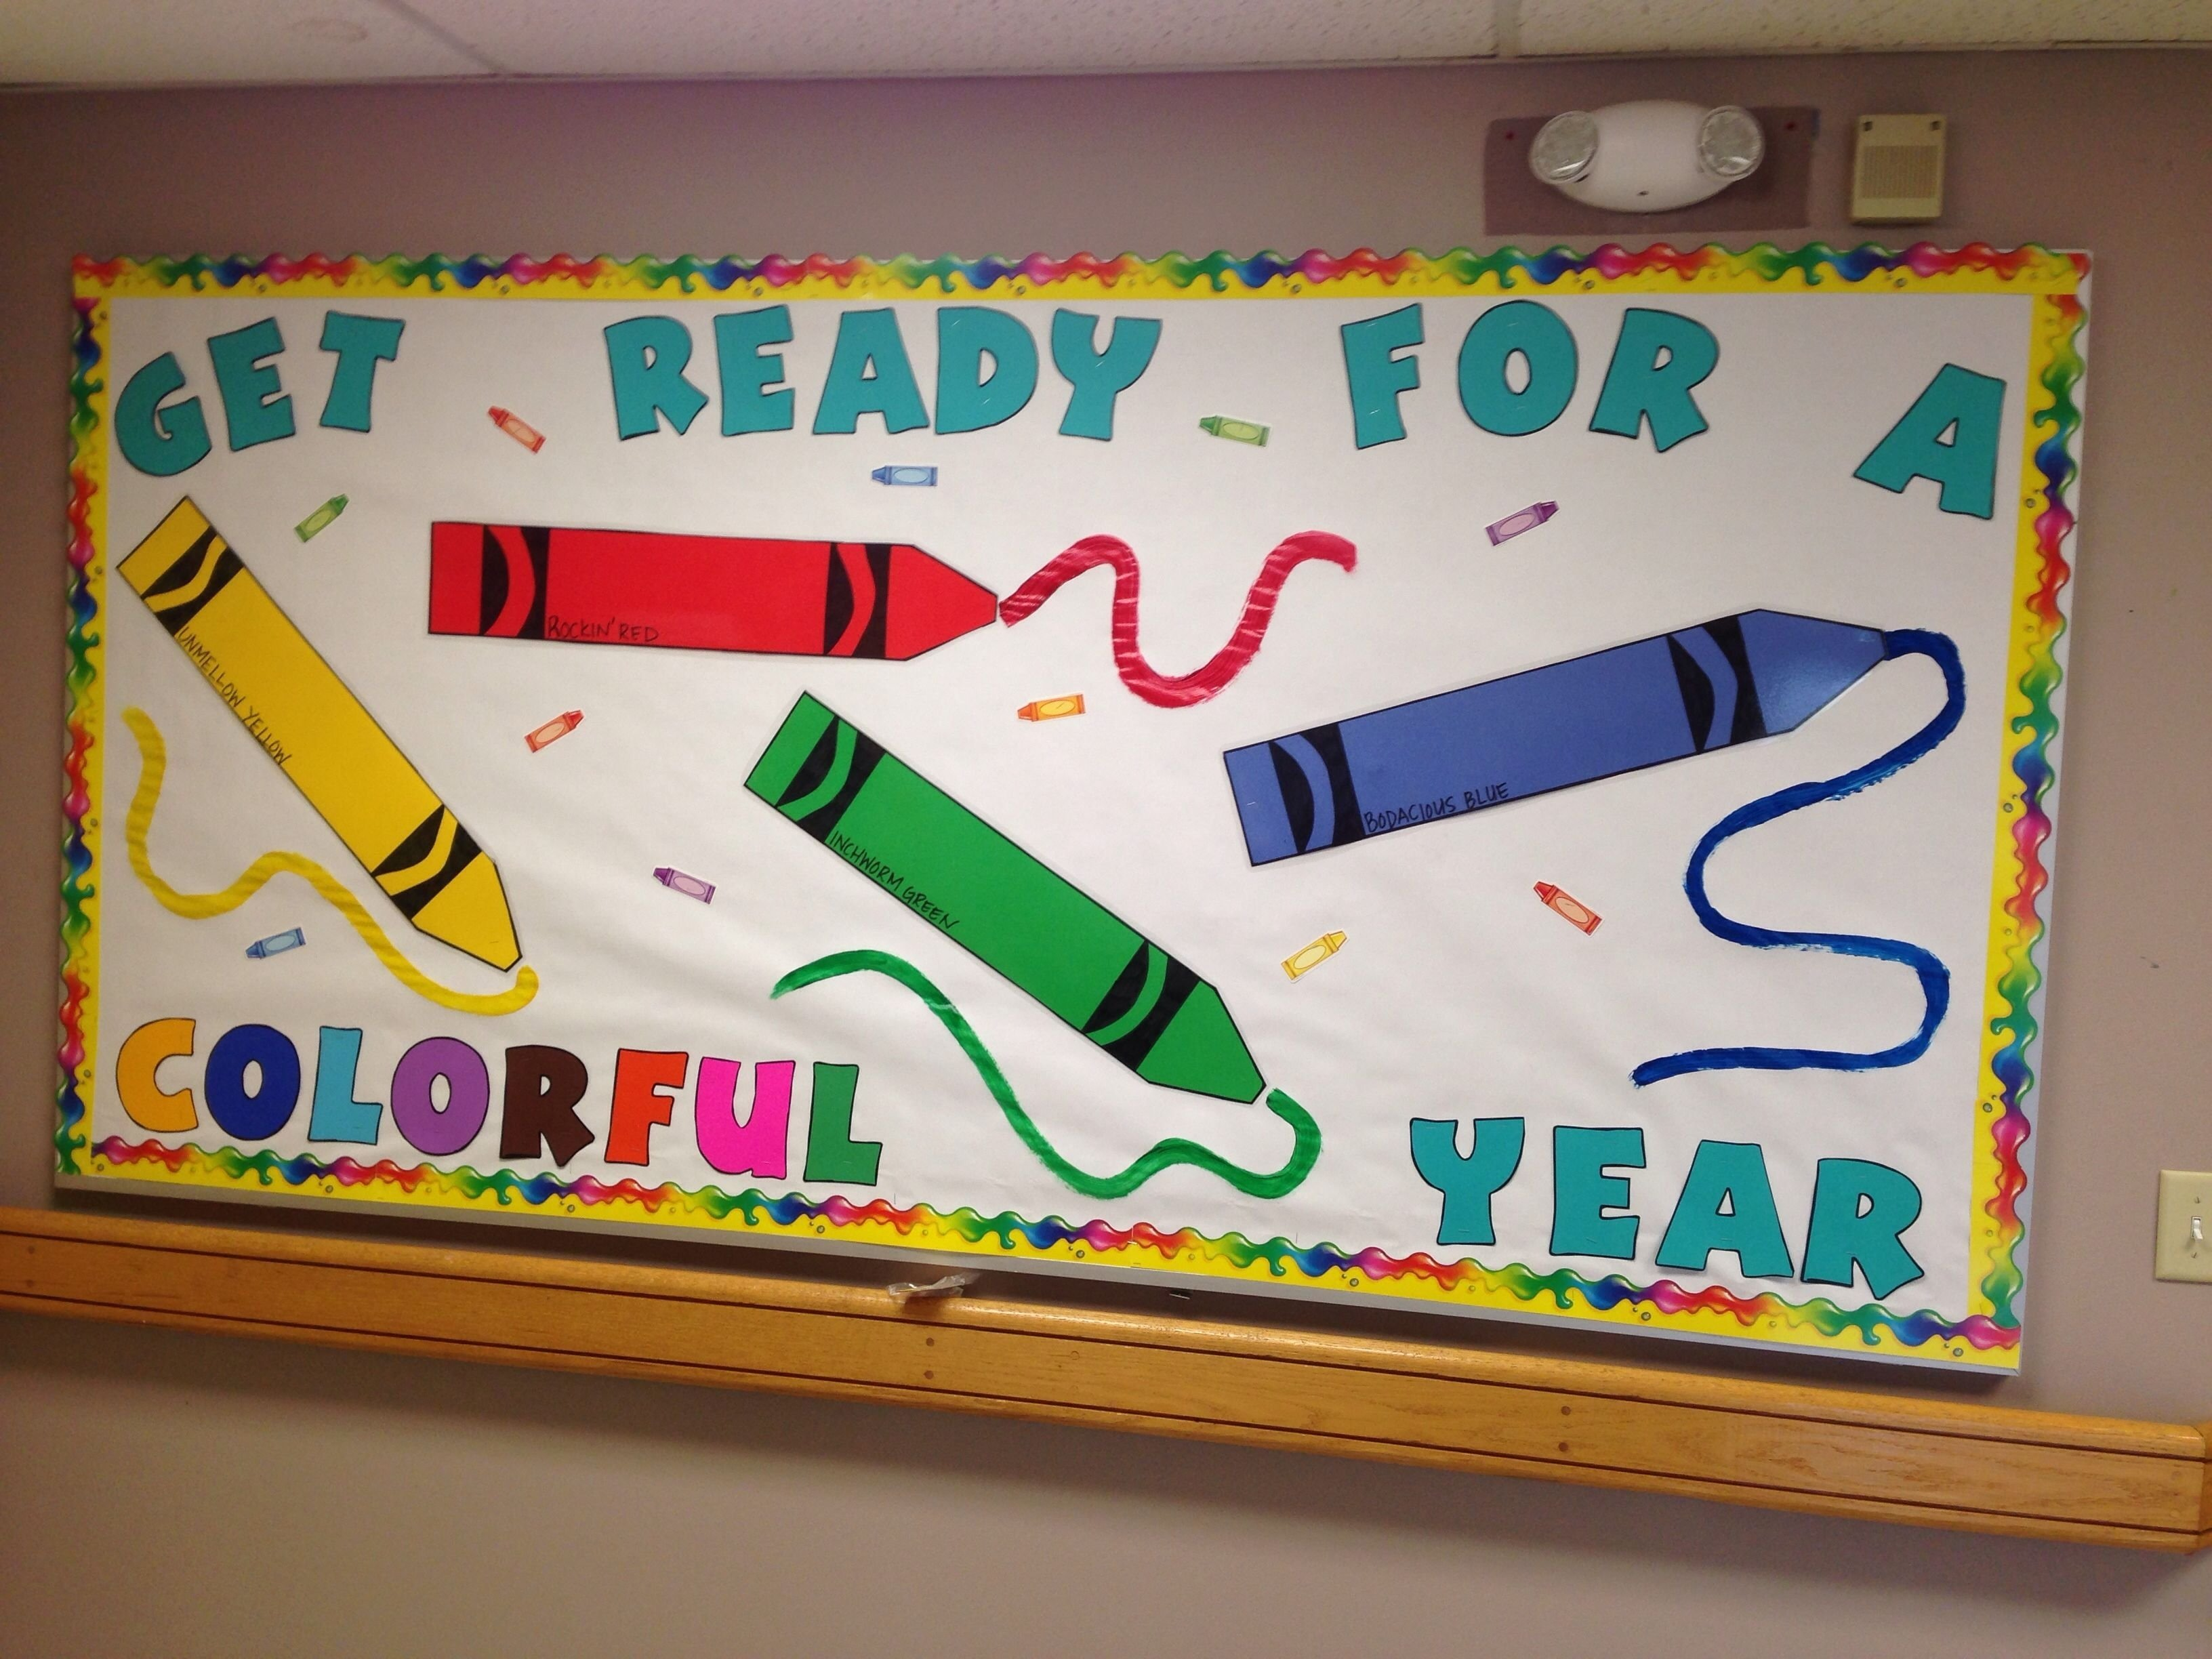 10 Wonderful Beginning Of The Year Bulletin Board Ideas crayon bulletin board for back to school bulletin boards 10 2021